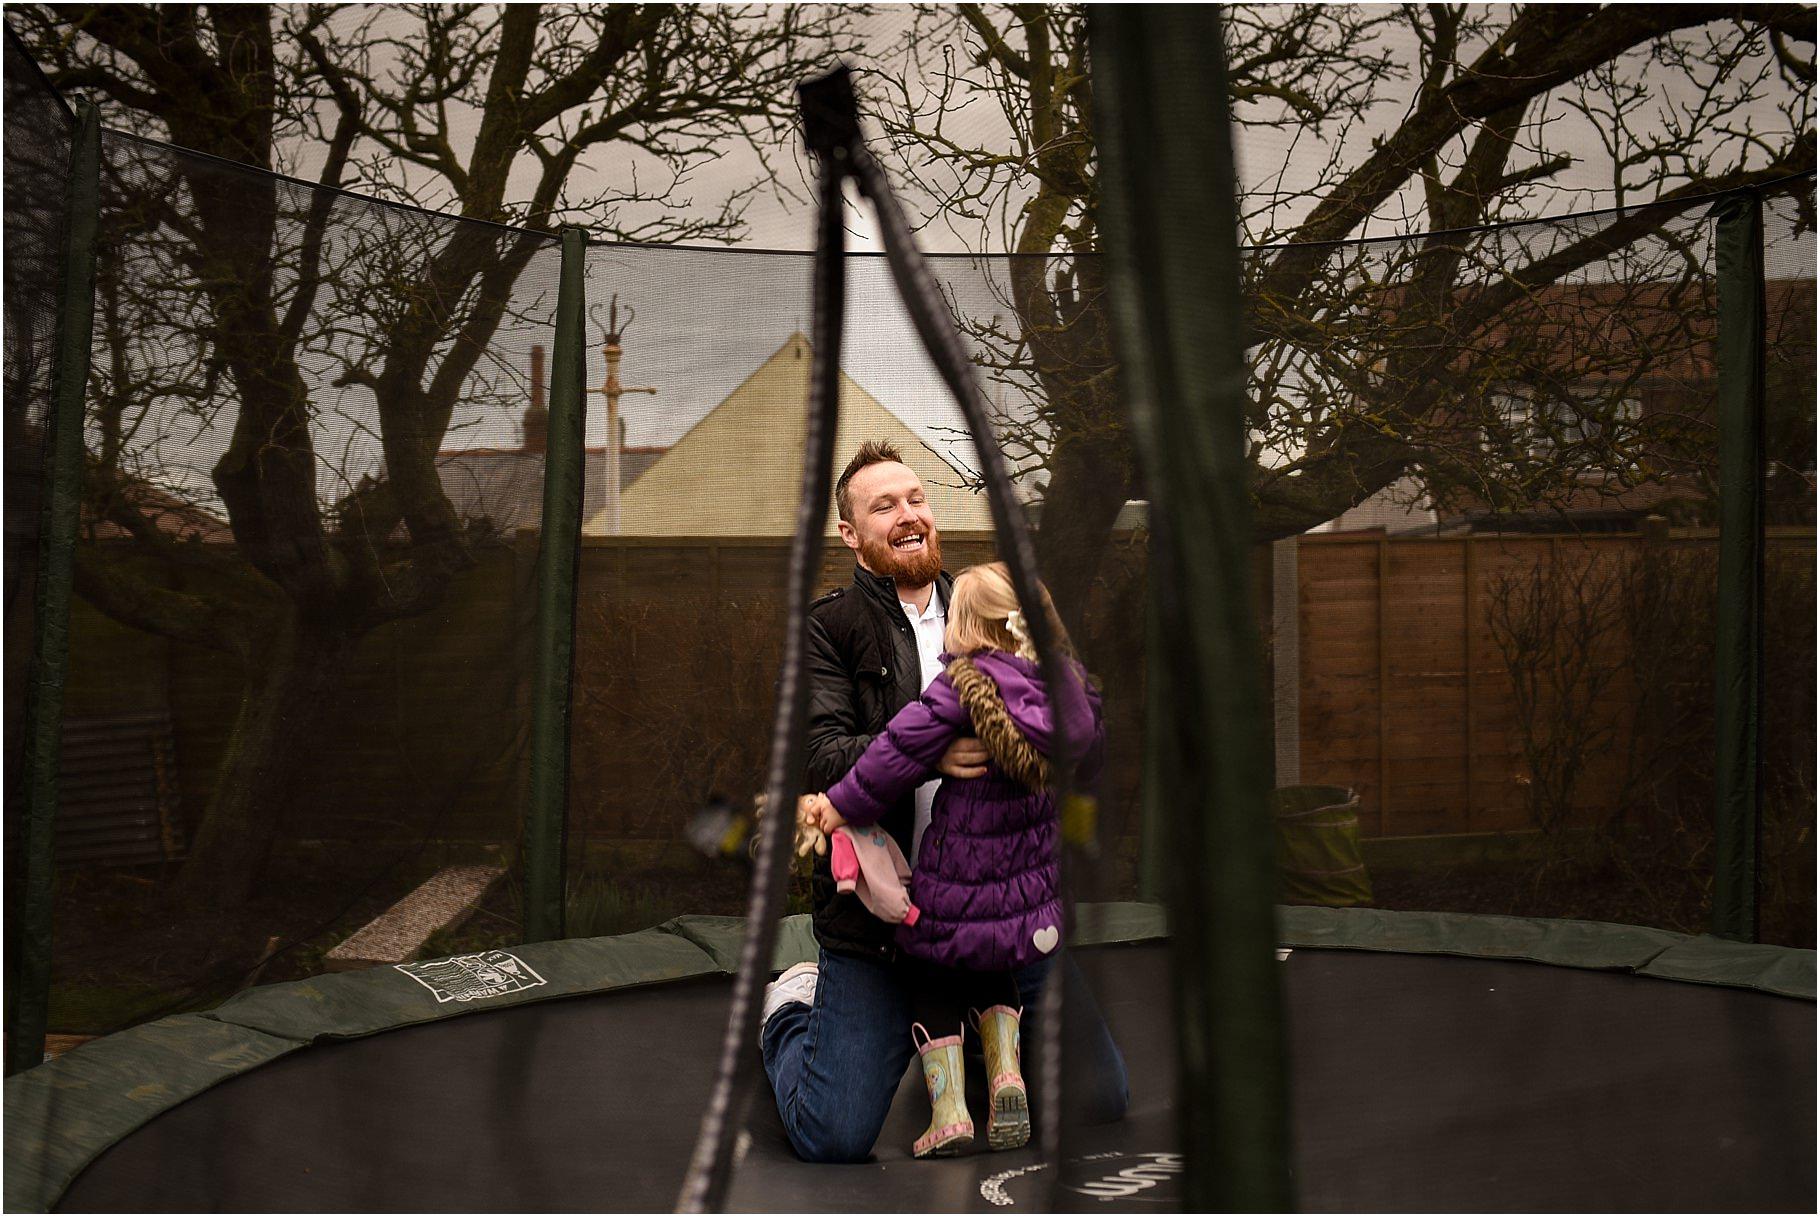 lancashire-family-portraits-documentary-newborn-27.jpg